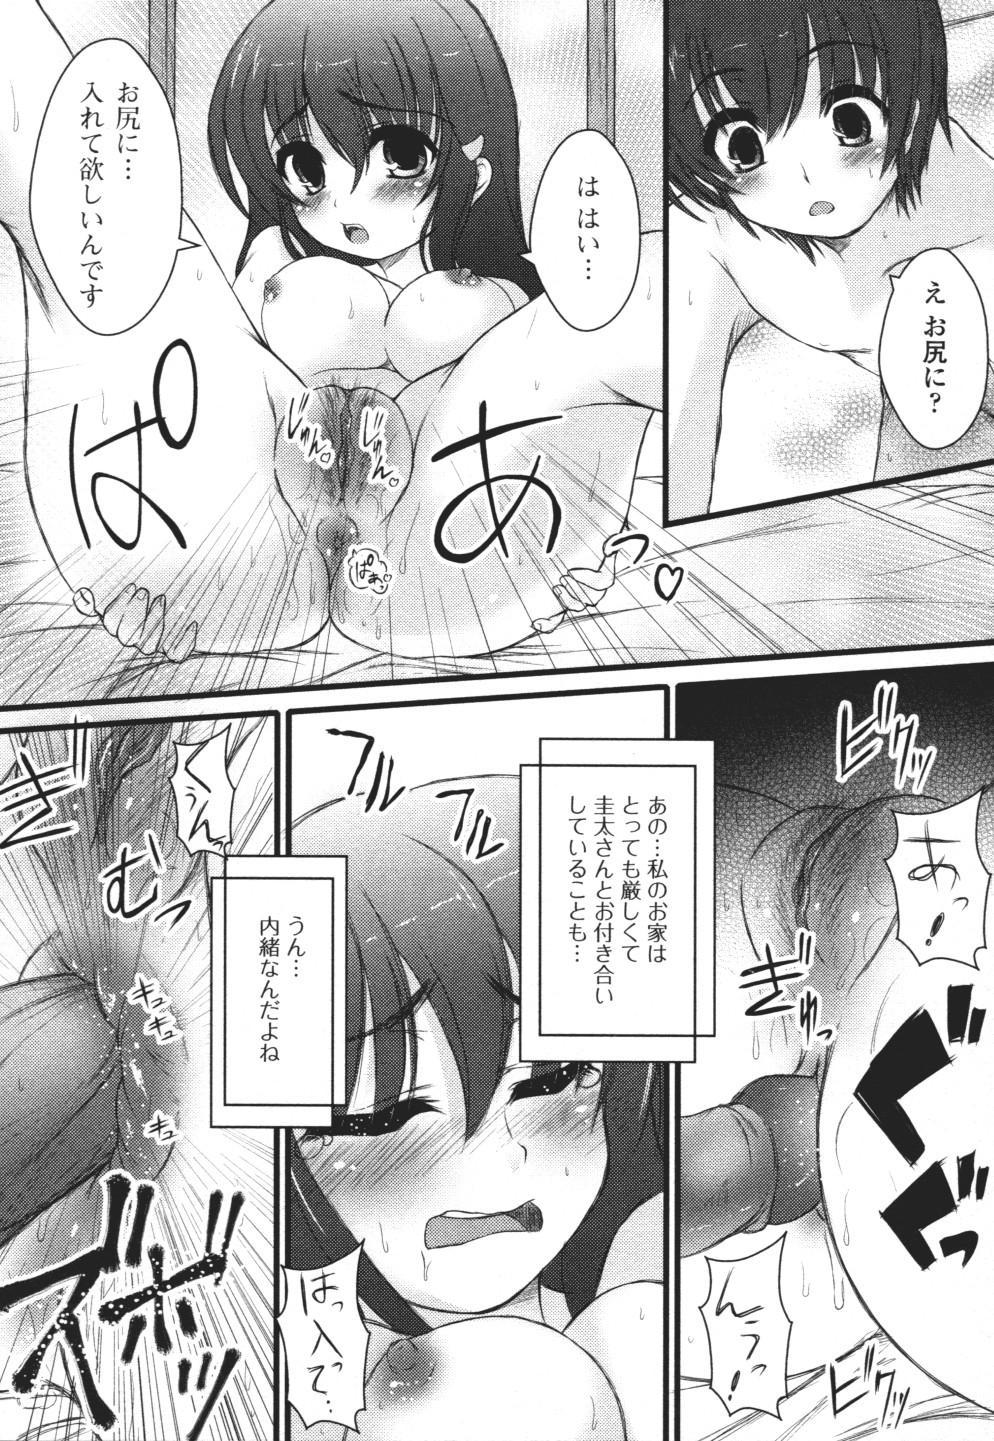 Nozoite wa Ikenai 3 - Do Not Peep! 3 146